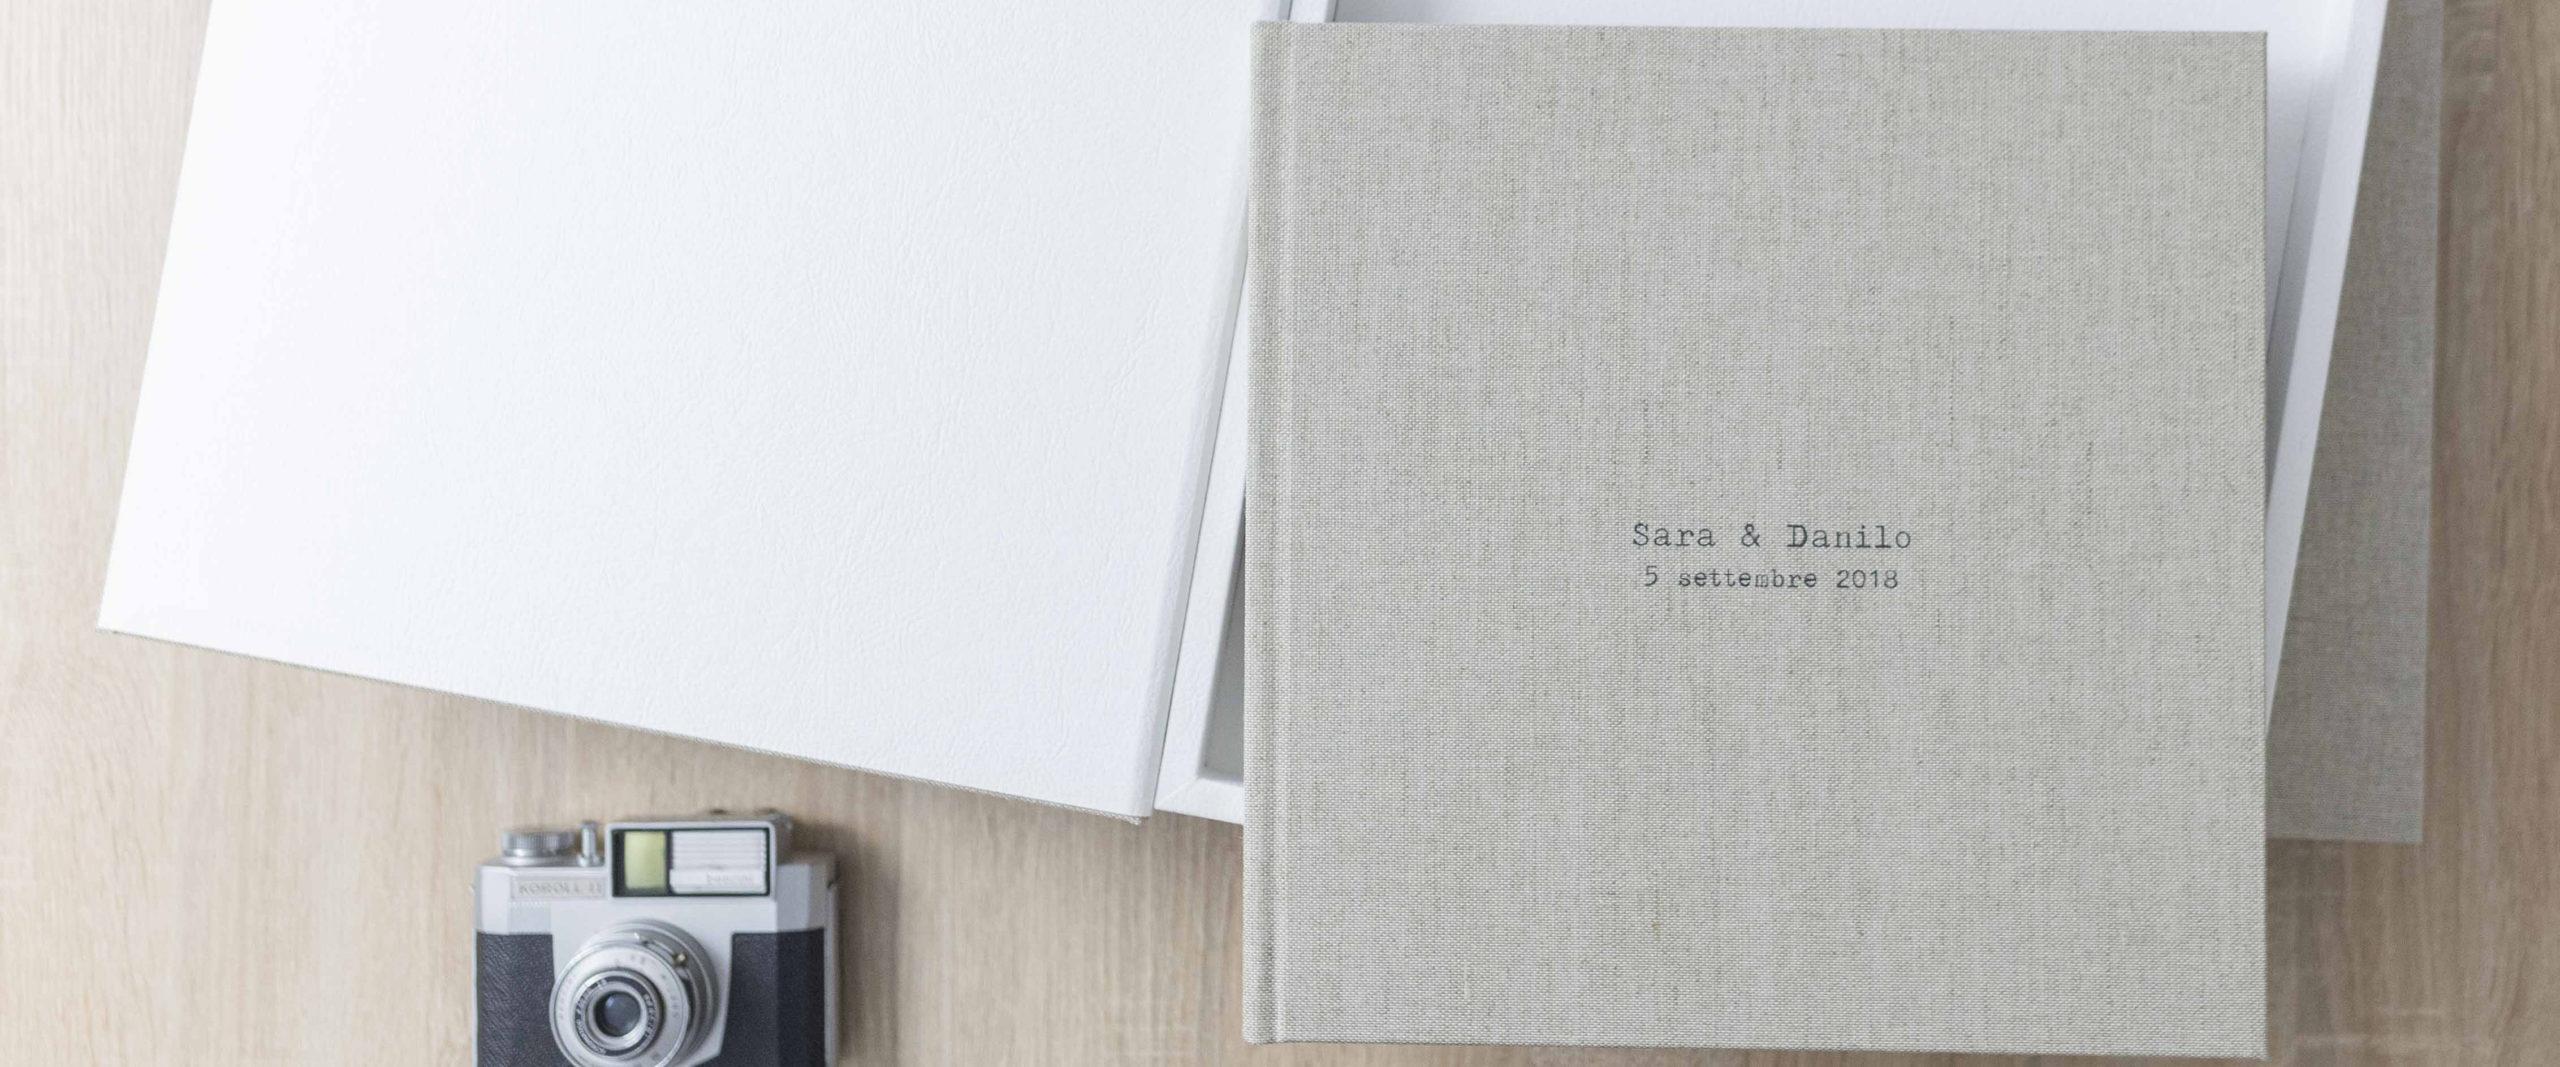 Recensione Fotolibro Professional Line Saal Digital